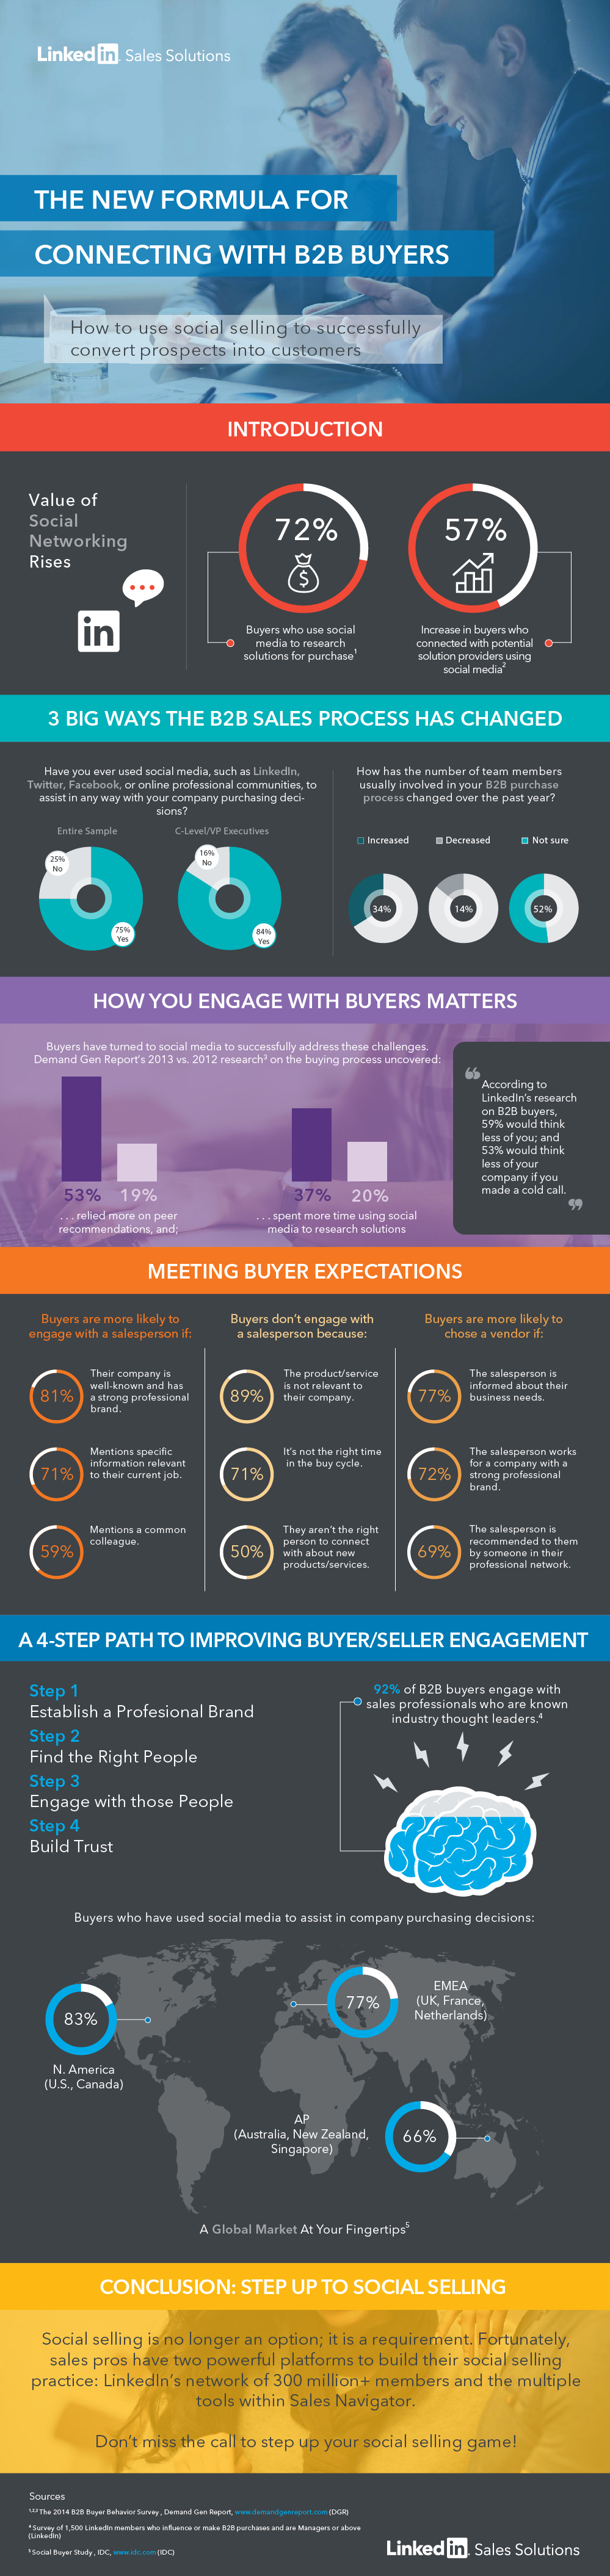 b2b sales engagement infographic